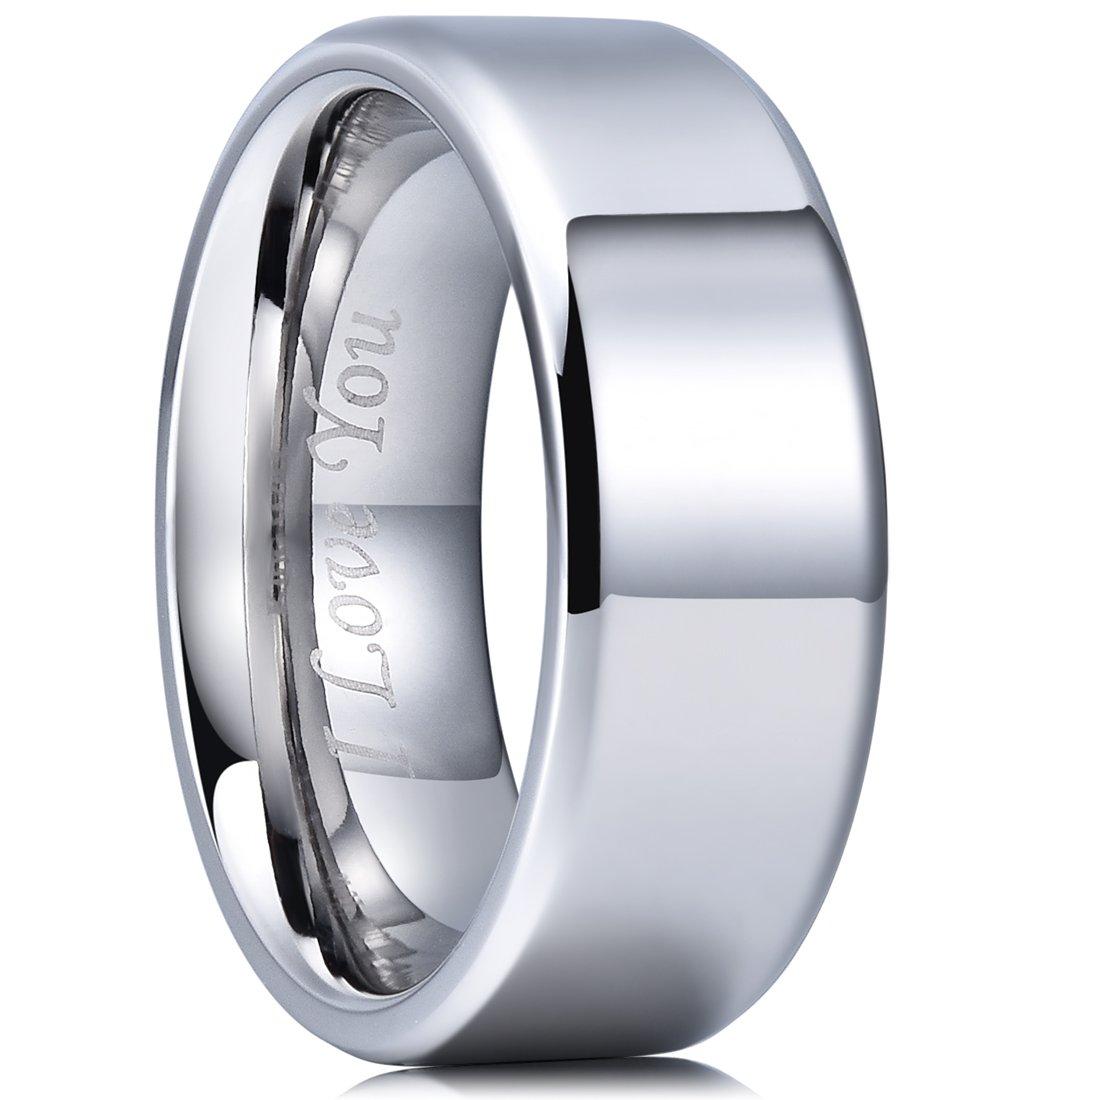 King Will Basic 8mm Stainless Steel Ring Polished Plain Beveled Edge Wedding Band Laser Etched I Love You 10